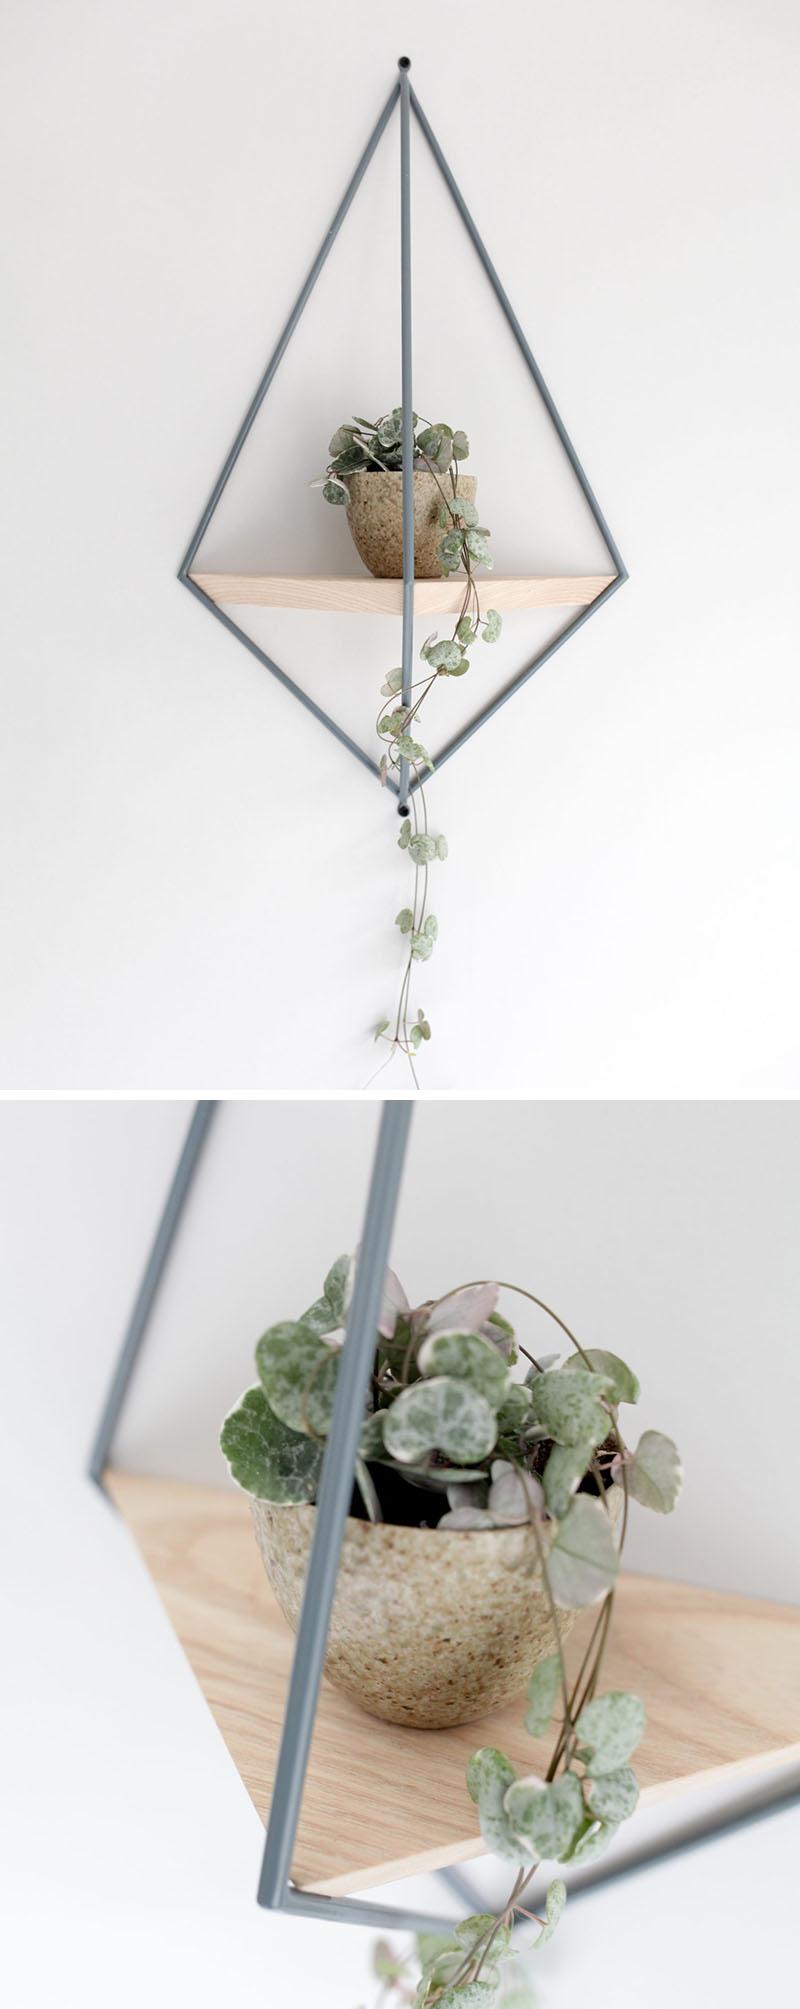 53 Indoor Garden Idea - Hang Your Plants From The Ceiling ...